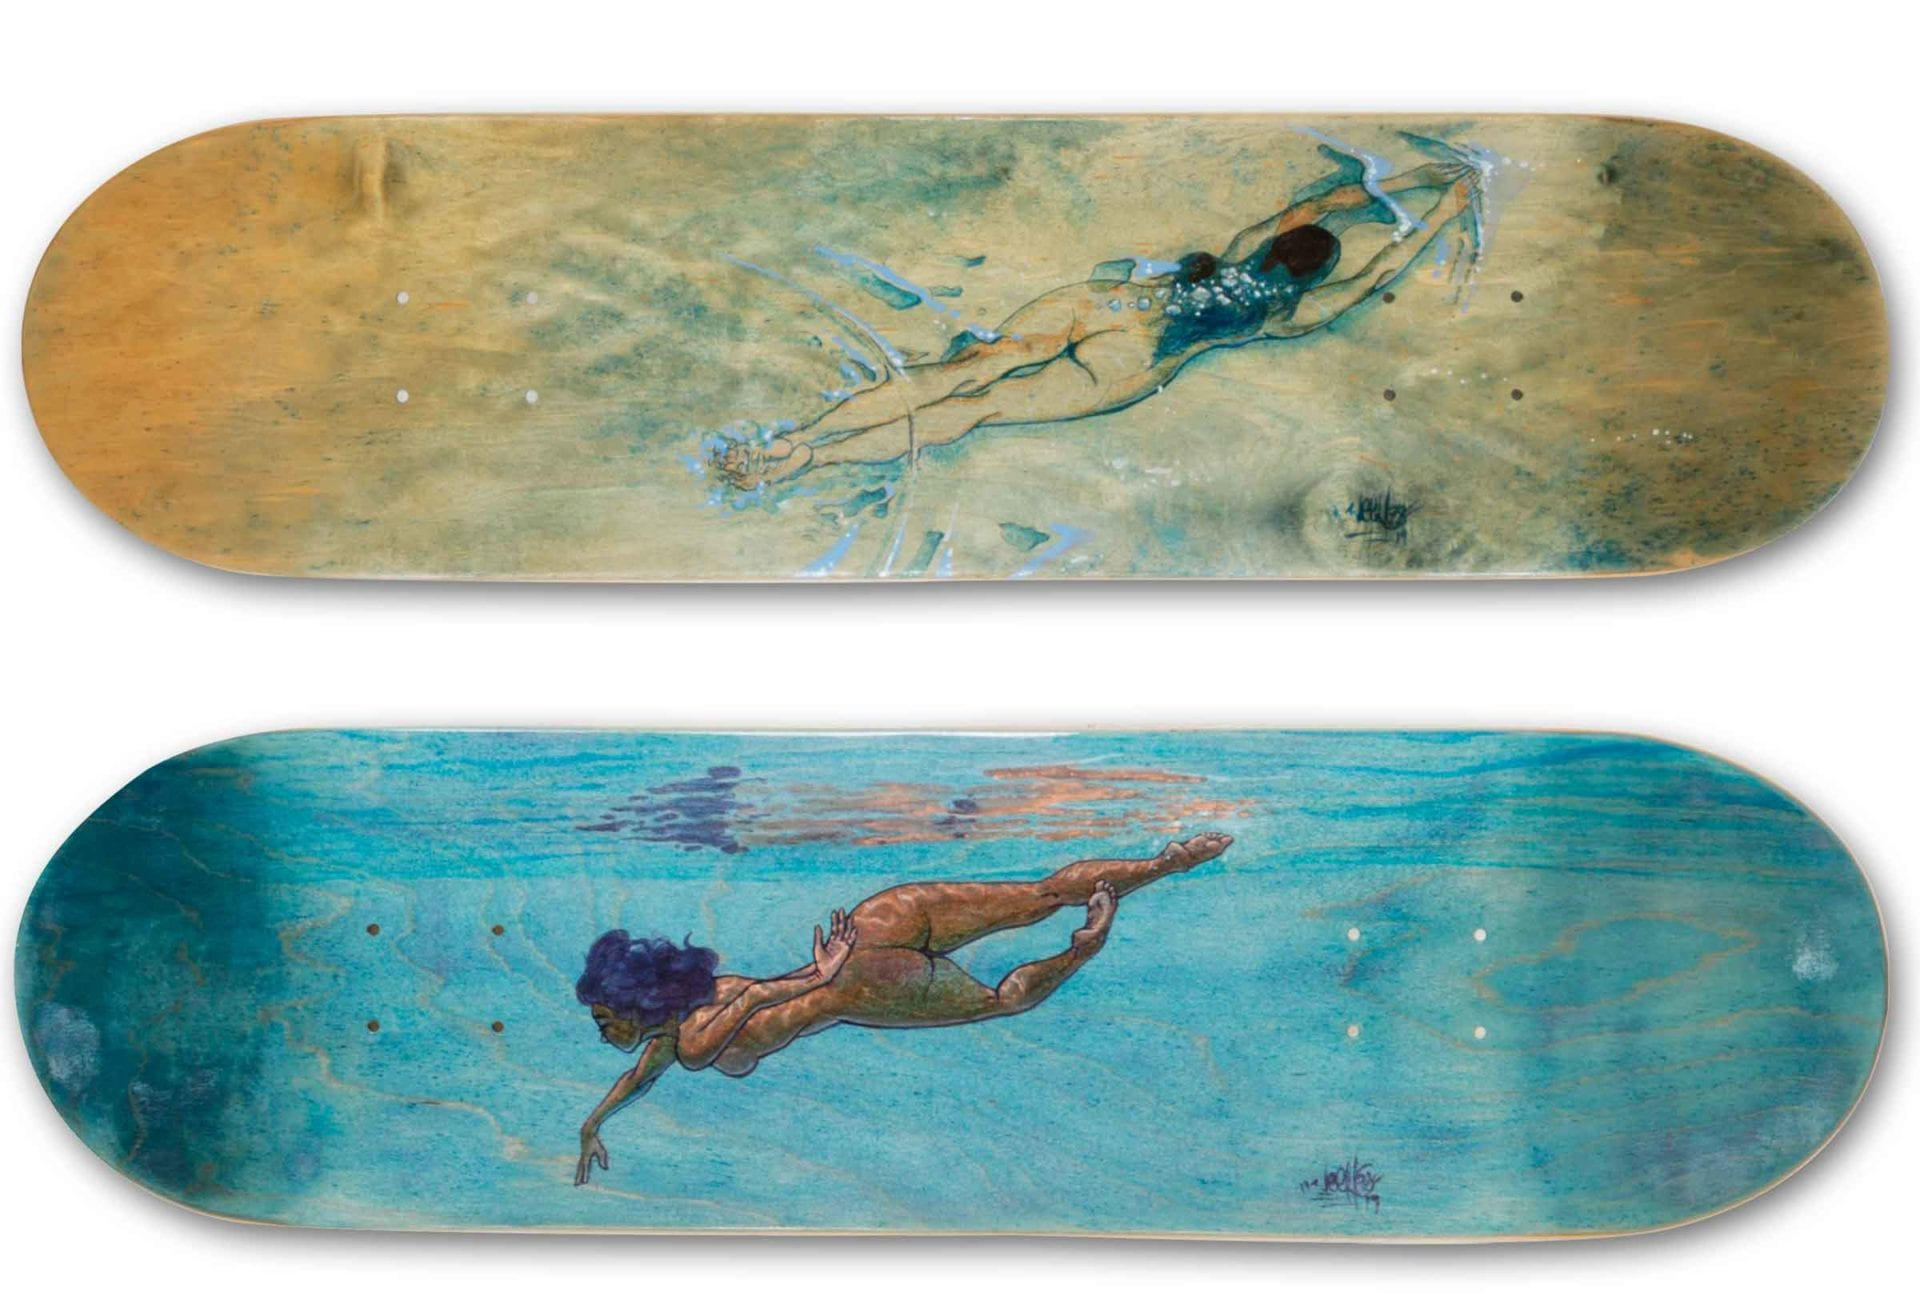 Underwater Love Skateboardkunst - Brandmalerei - Werner Härtl